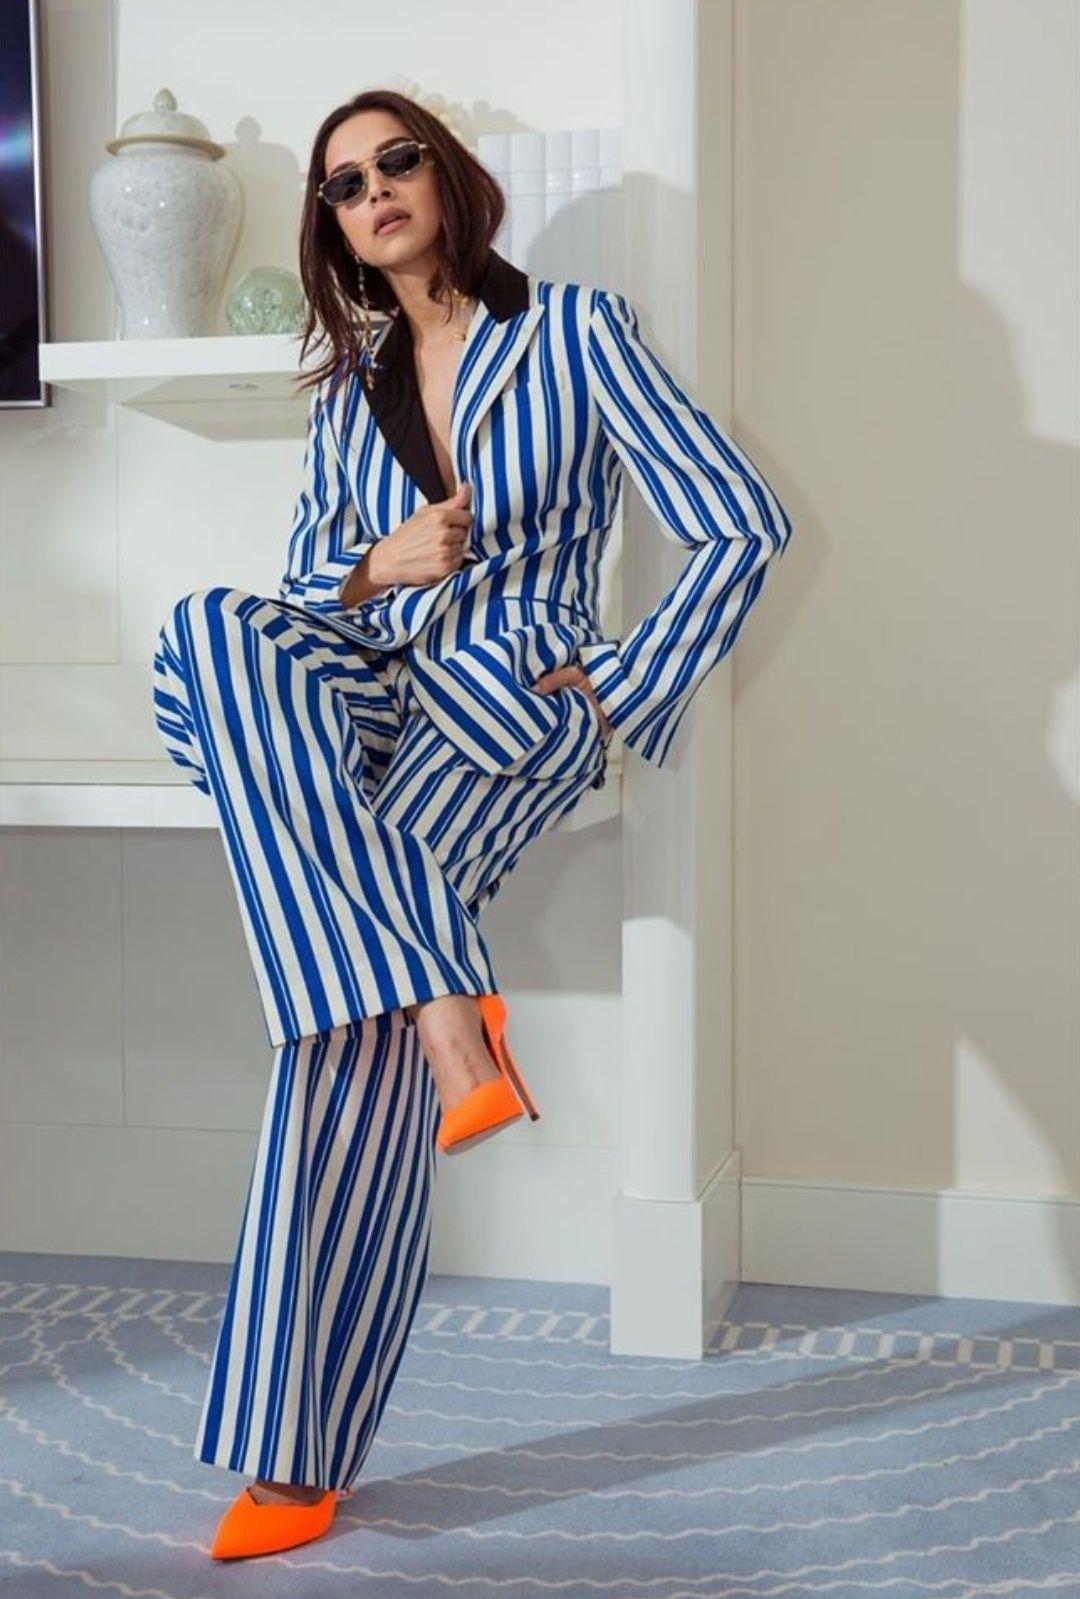 Deepika Padukone Latest Fashionable Stills from Cannes